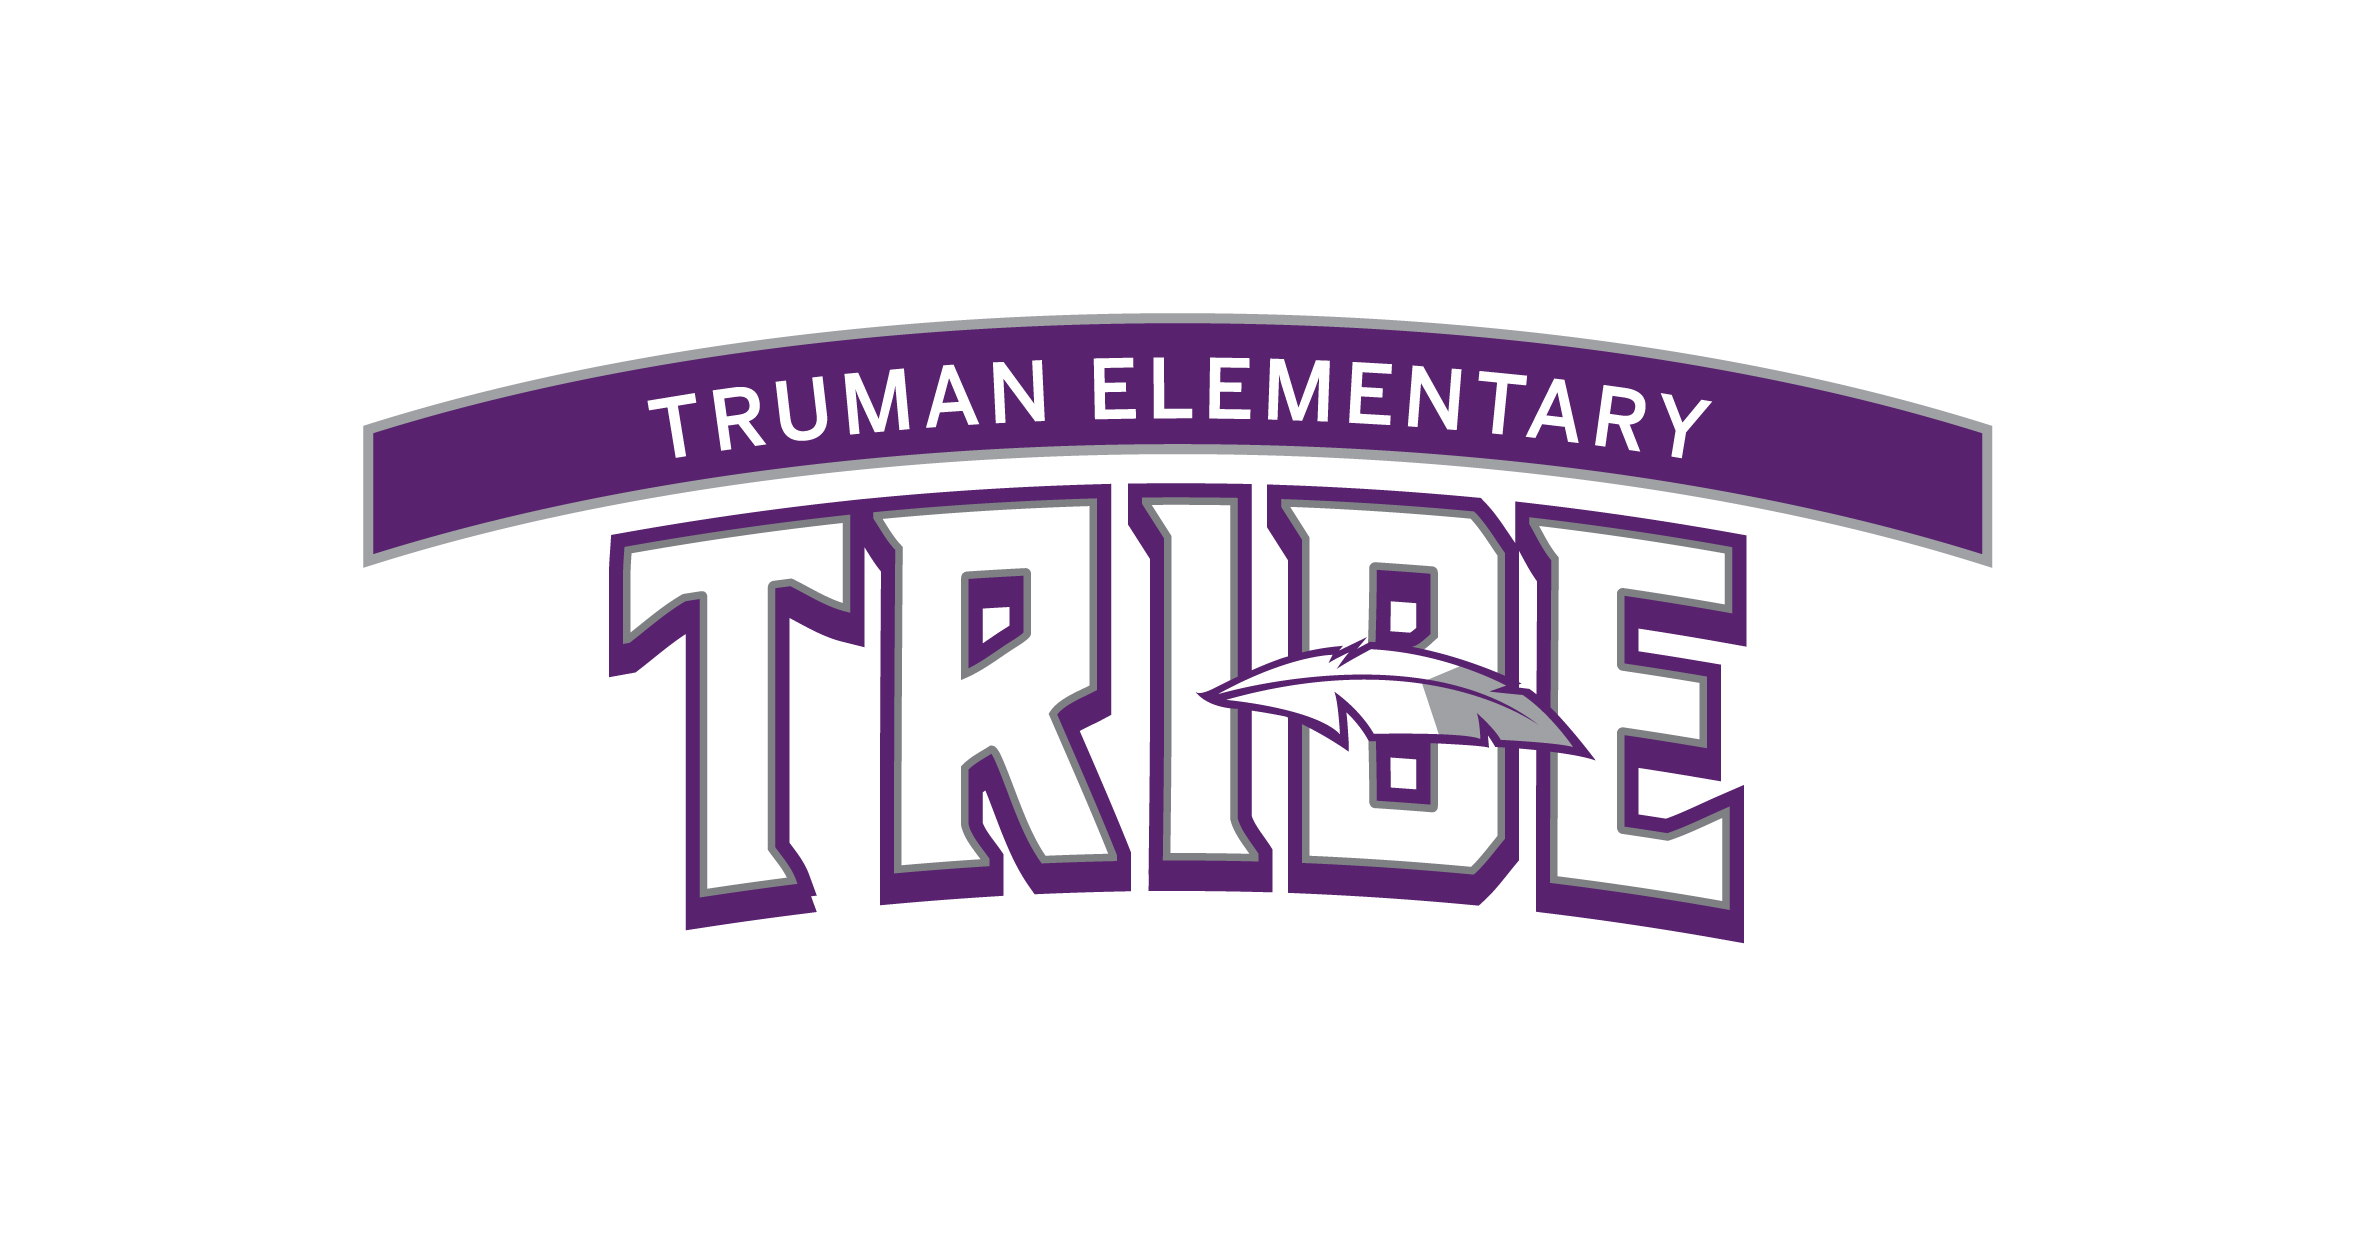 Truman Elementary Tribe